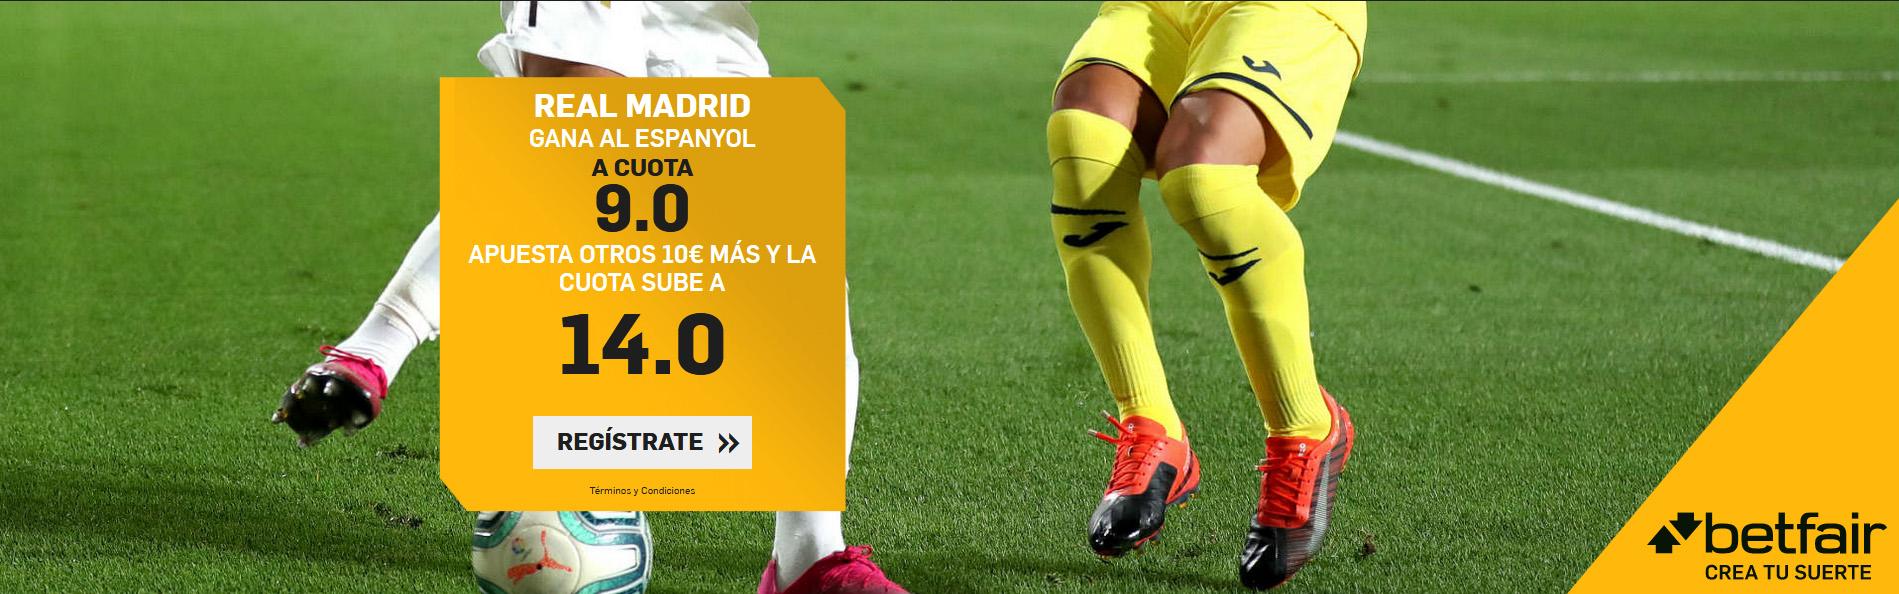 Cuota Mejorada 9 Real Madrid gana Espanyol Betfair